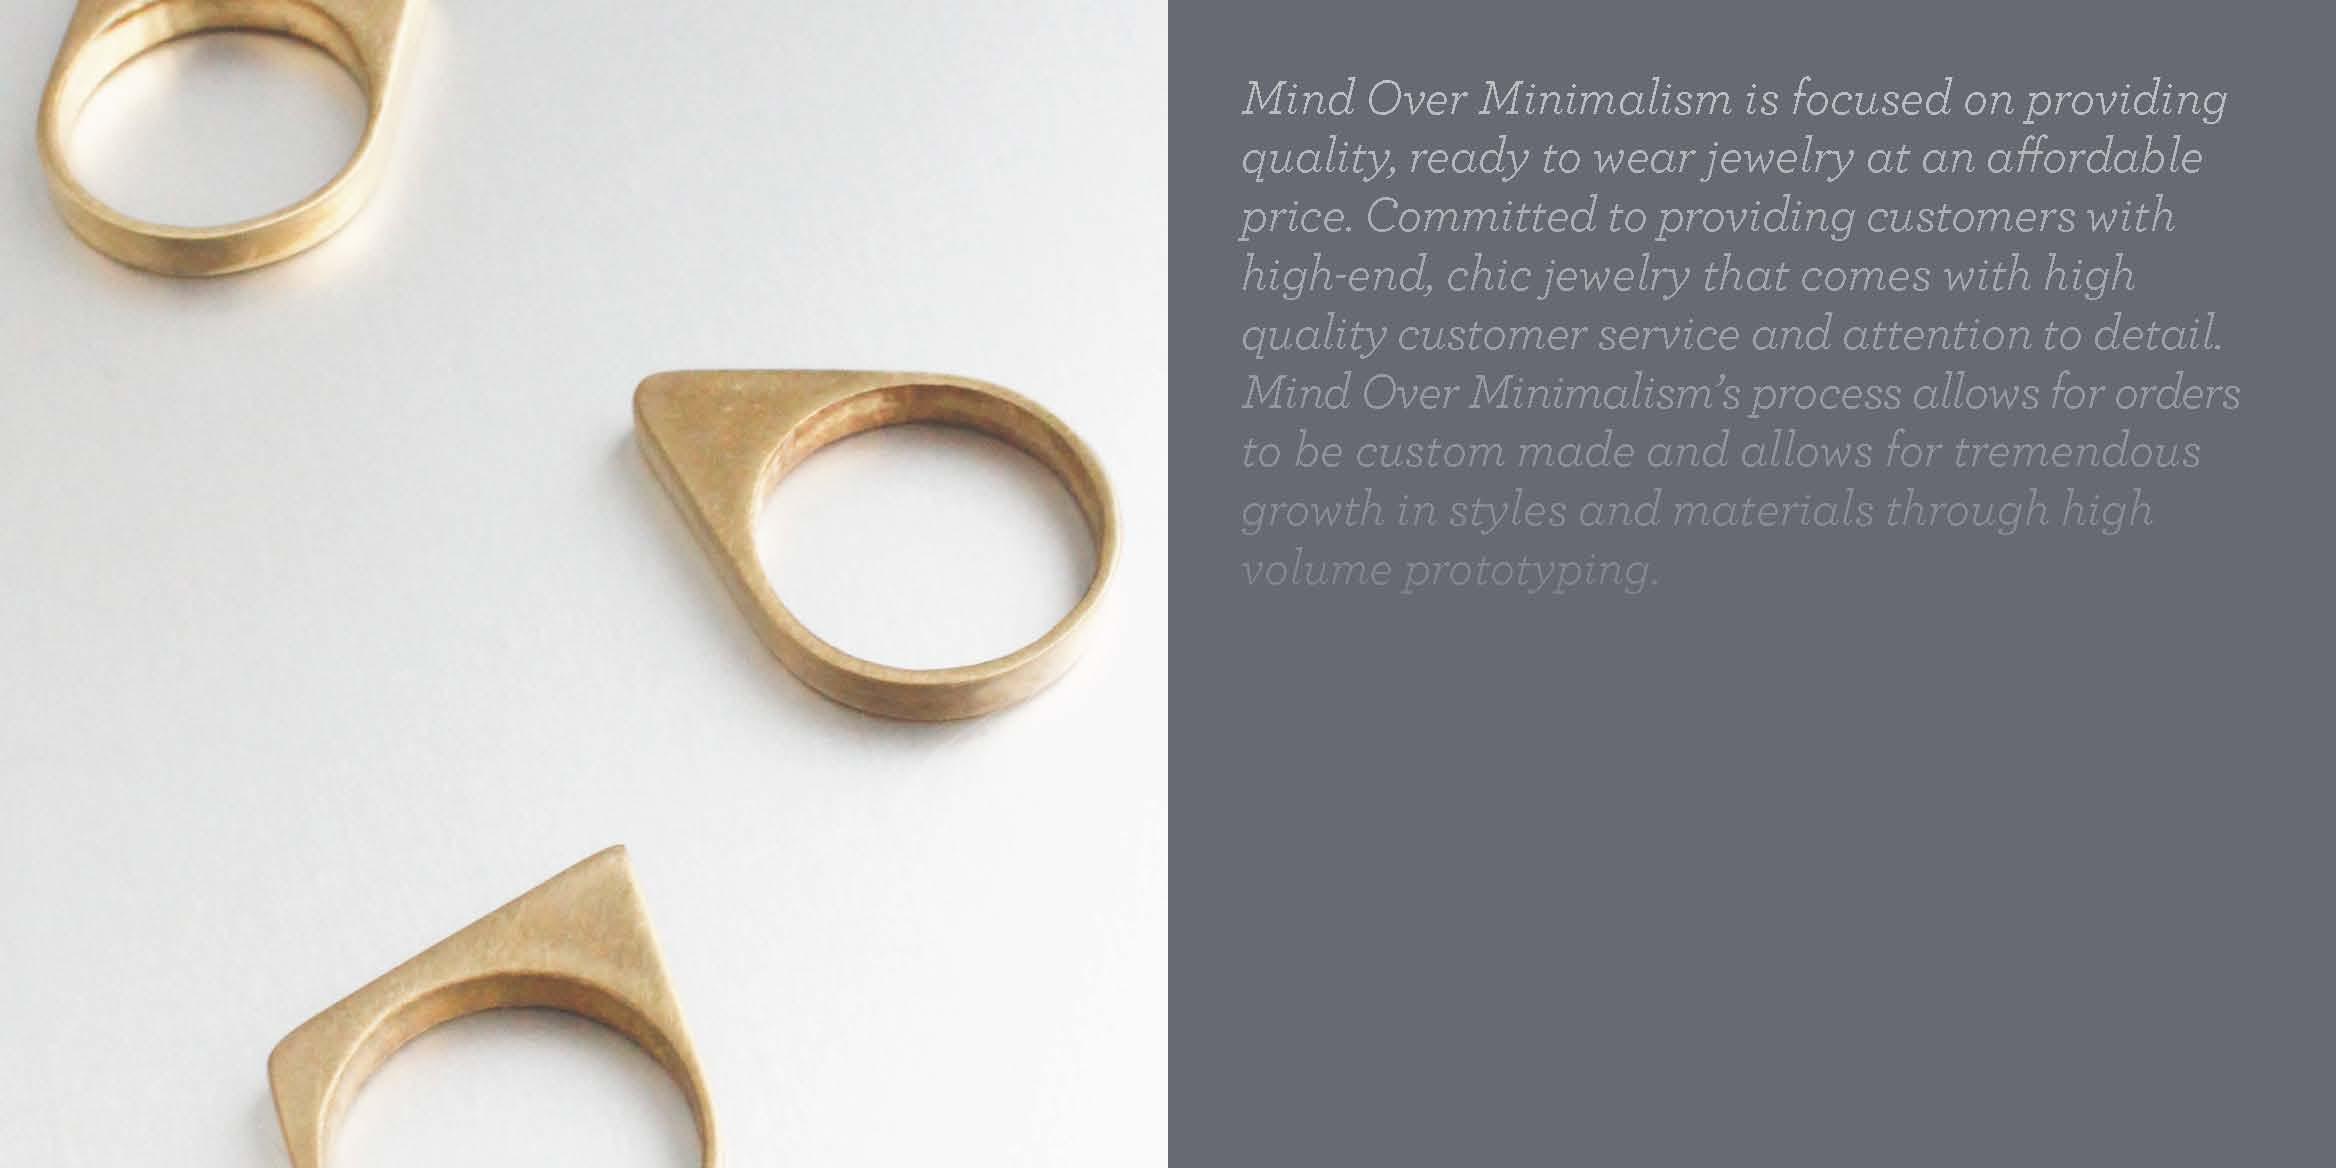 Mind Over Minimalism - image 2 - student project